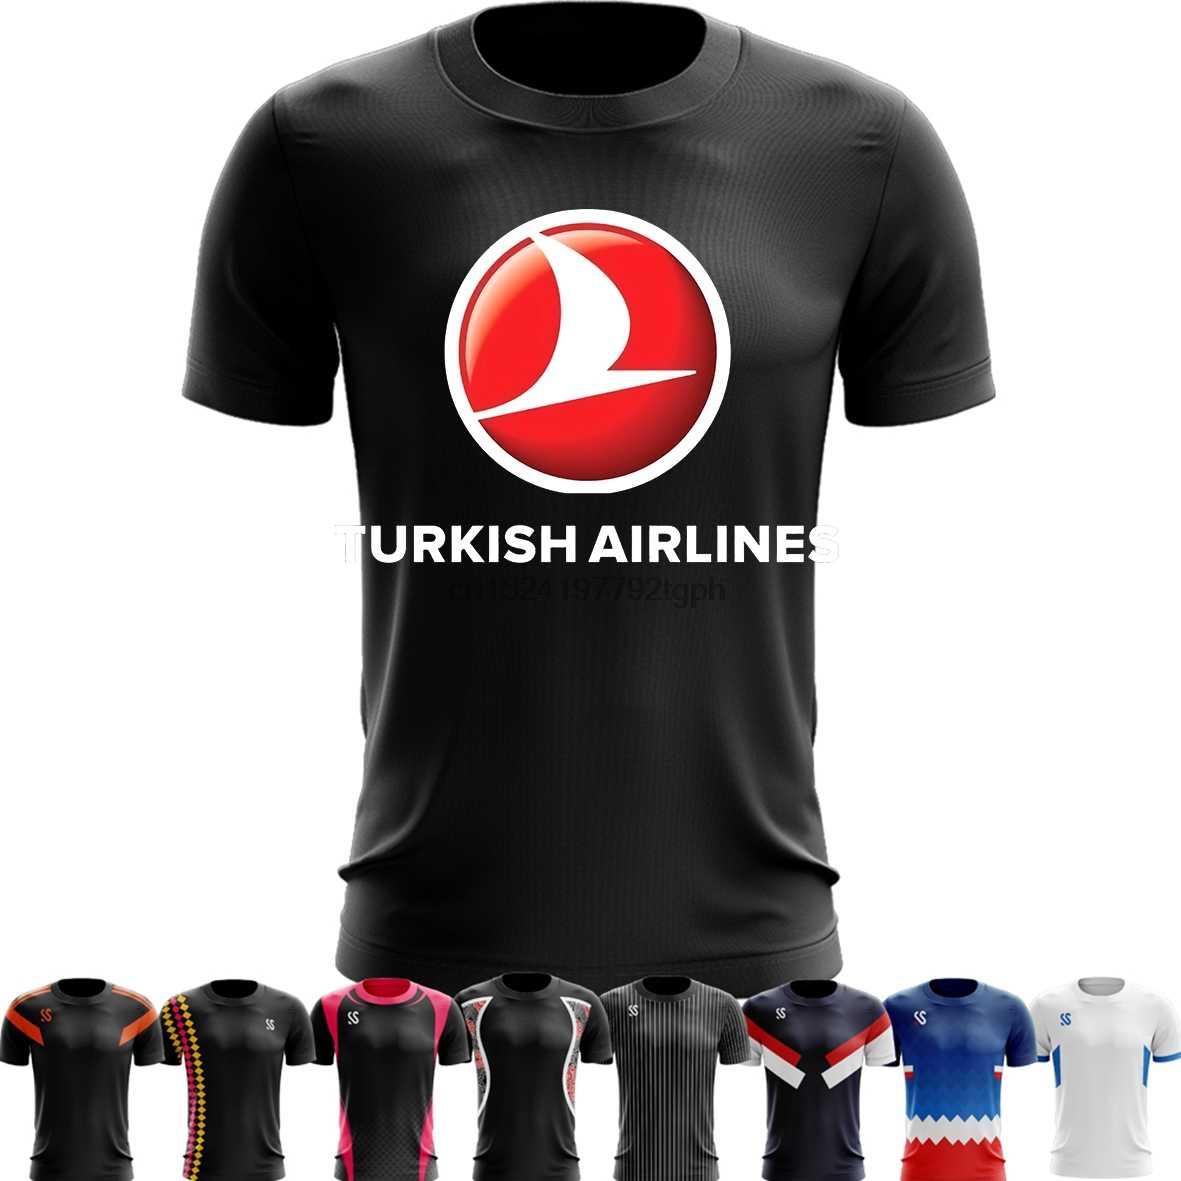 Sport Quick Dry Running Shirts Basketball Soccer Training T shirt turkish  airlines 4 Black Men Short Sleeve Tops 5XL 6XL